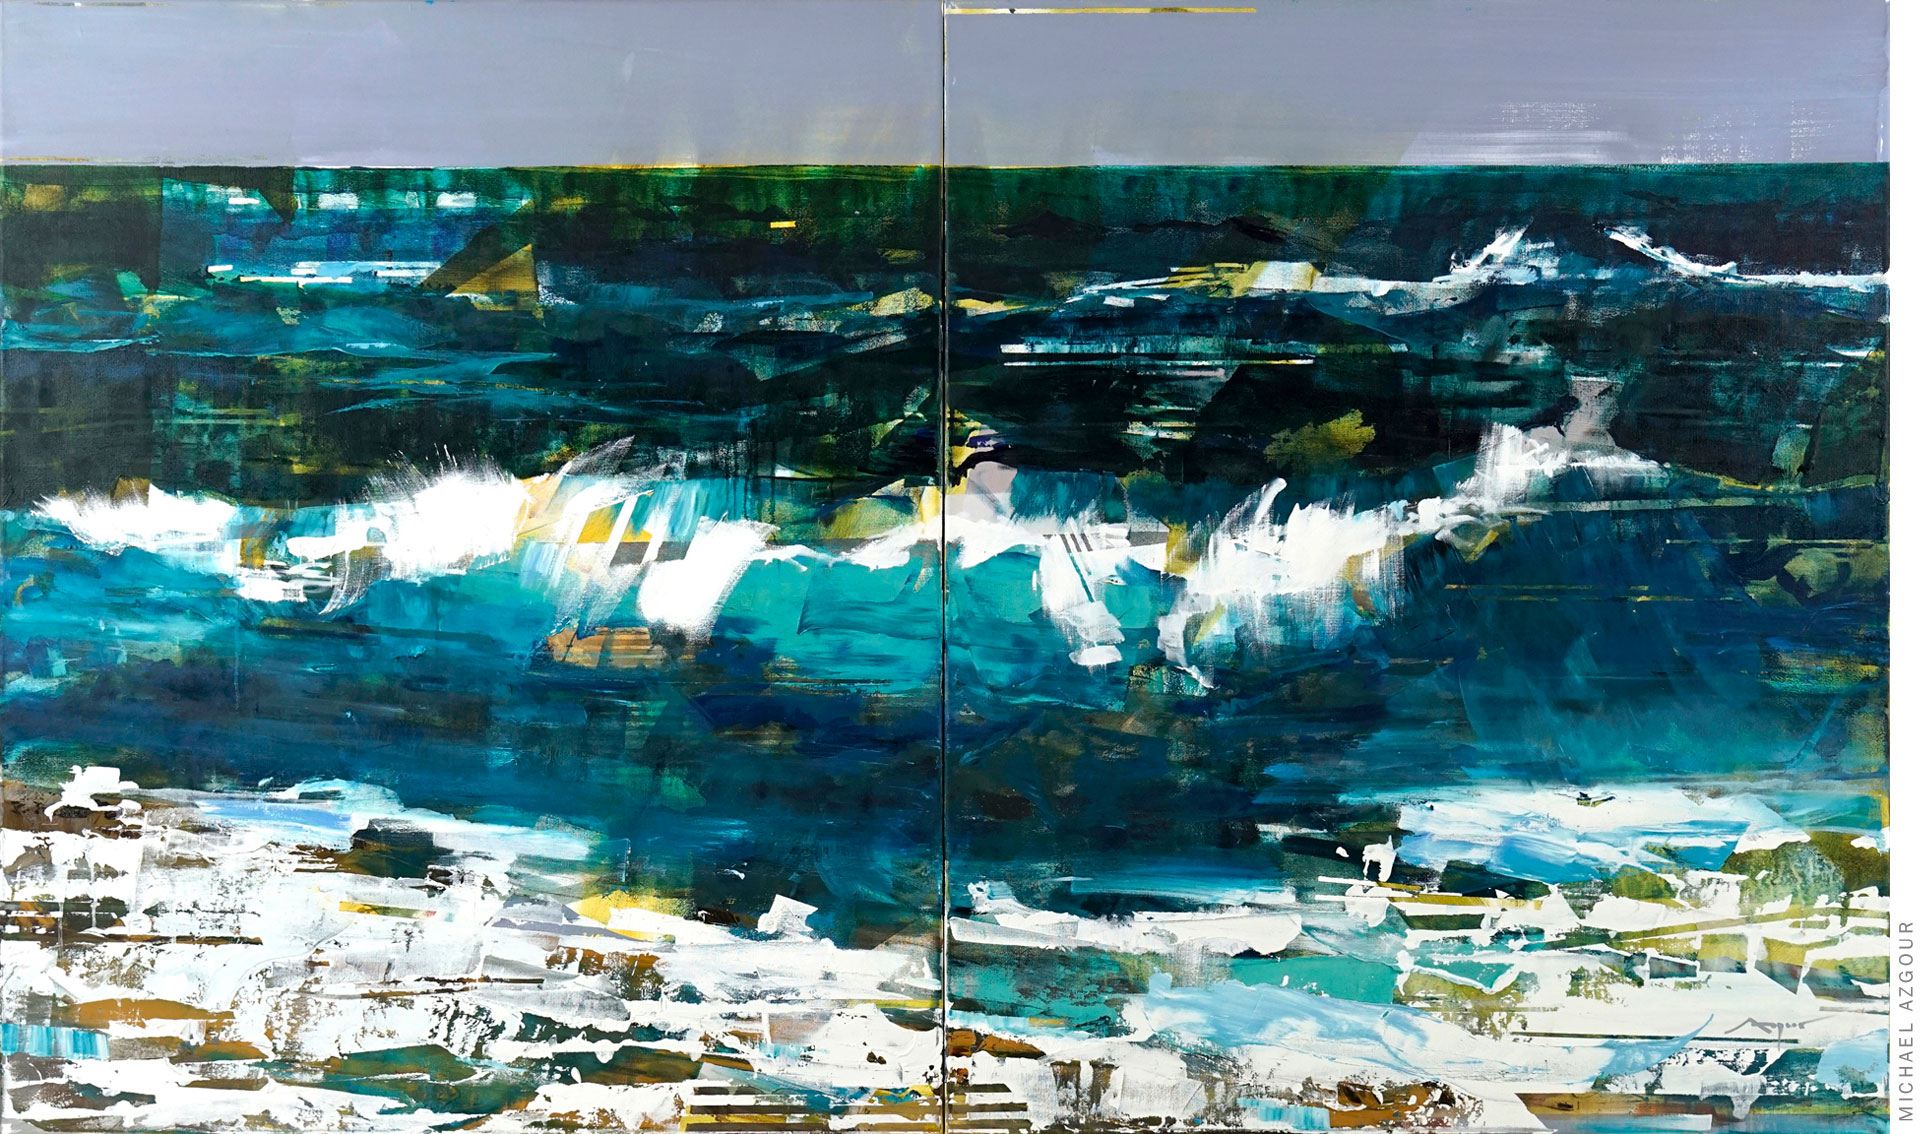 Ocean artwork depicting a wave crashing on the shore, a contemporary work by California artist Michael Azgour